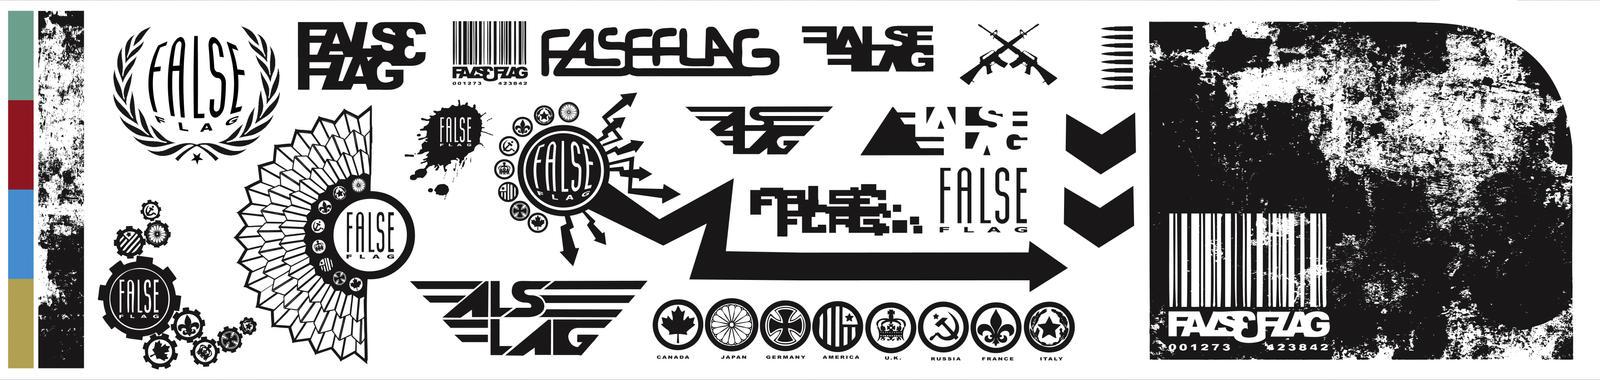 FALSE.FLAG.draftlogos.01 by Pie89 on DeviantArt